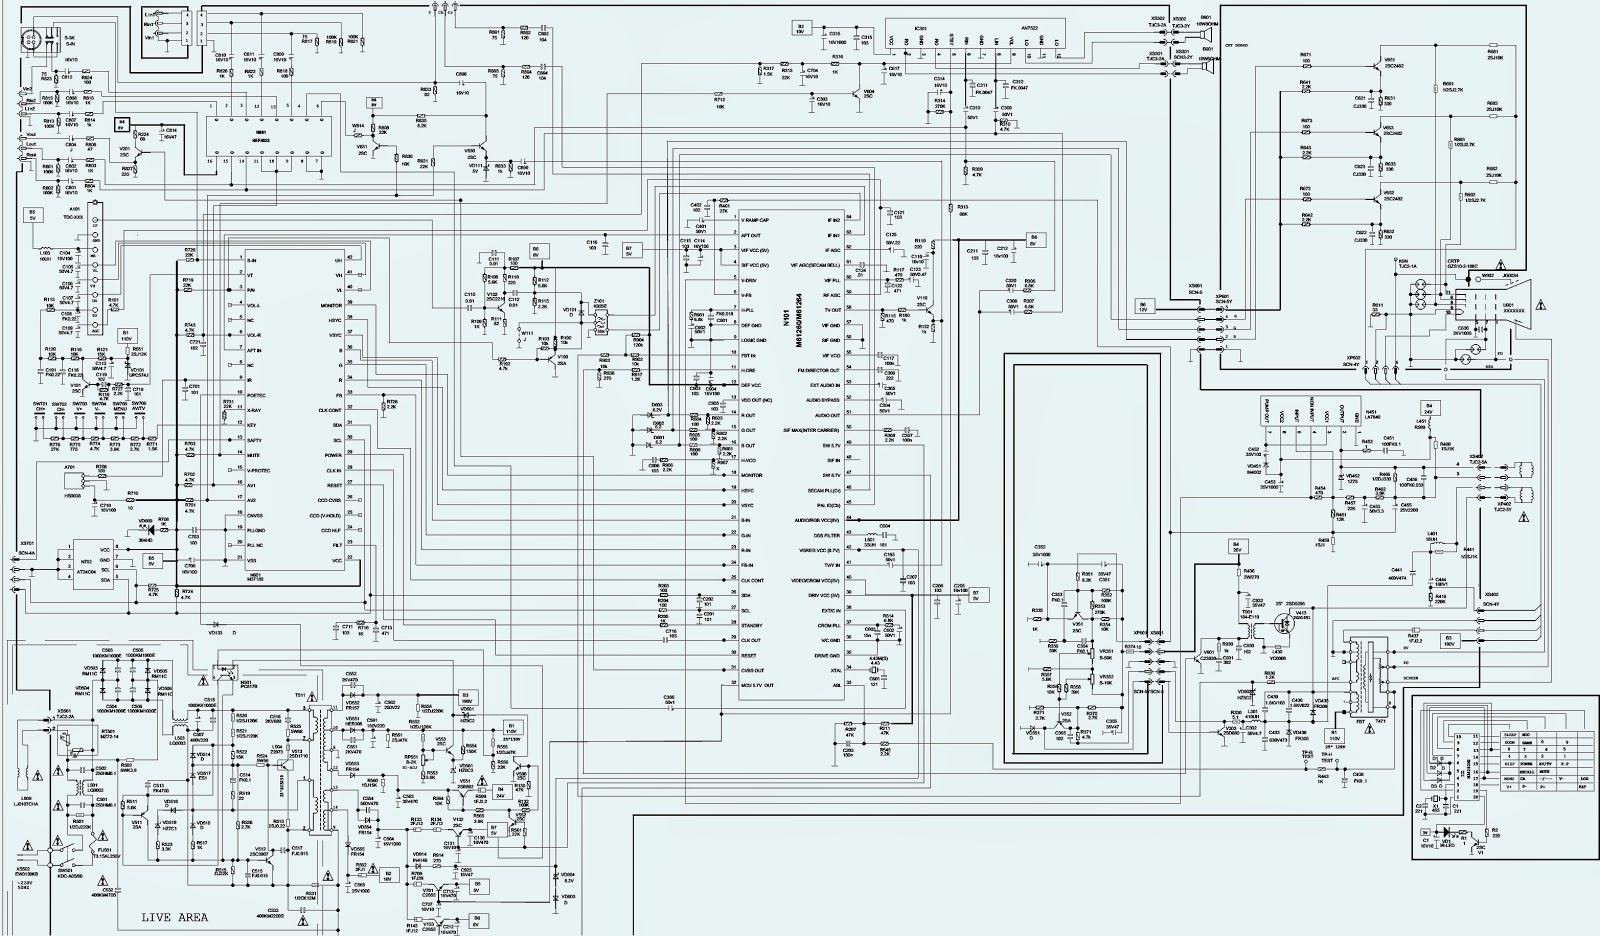 medium resolution of samsung tv schematic layout best site wiring harness samsung tv wiring diagram tv and component wiring